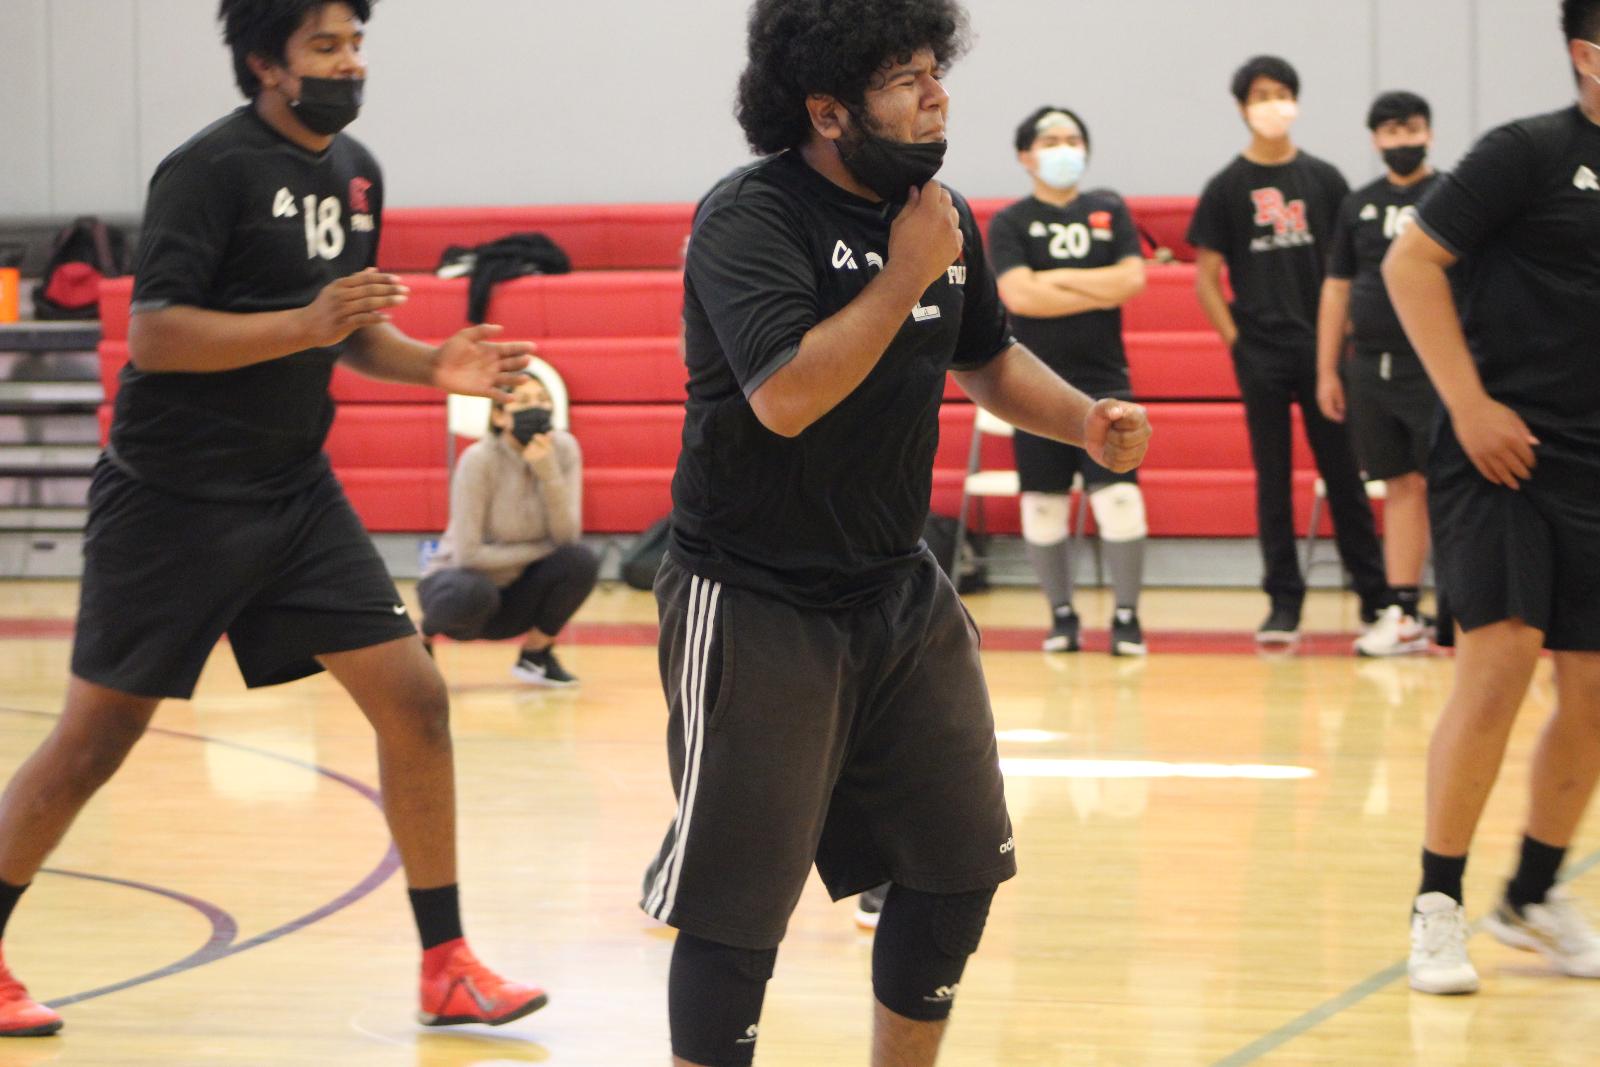 Boys Volleyball to start CIF Playoffs